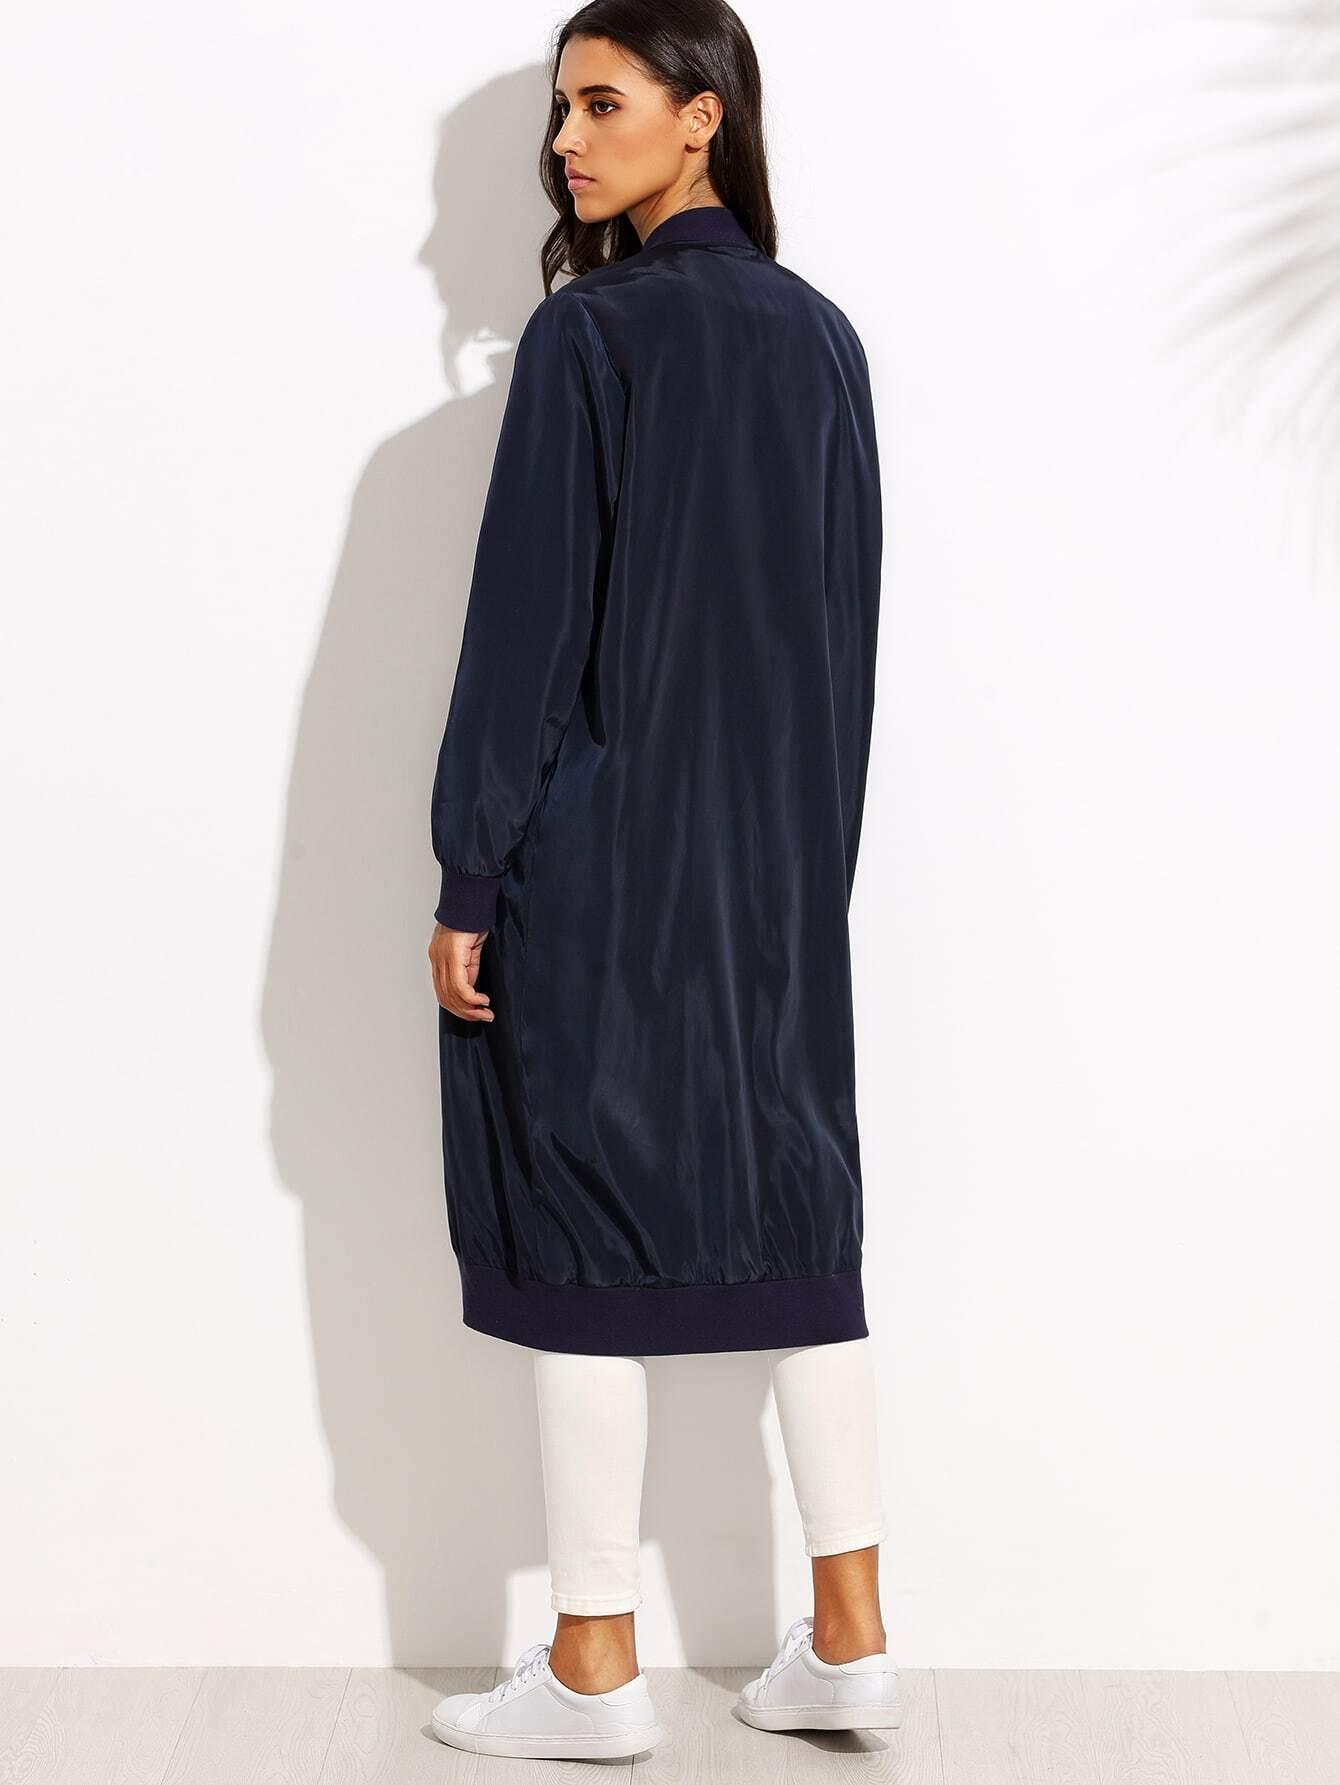 outerwear160809702_2